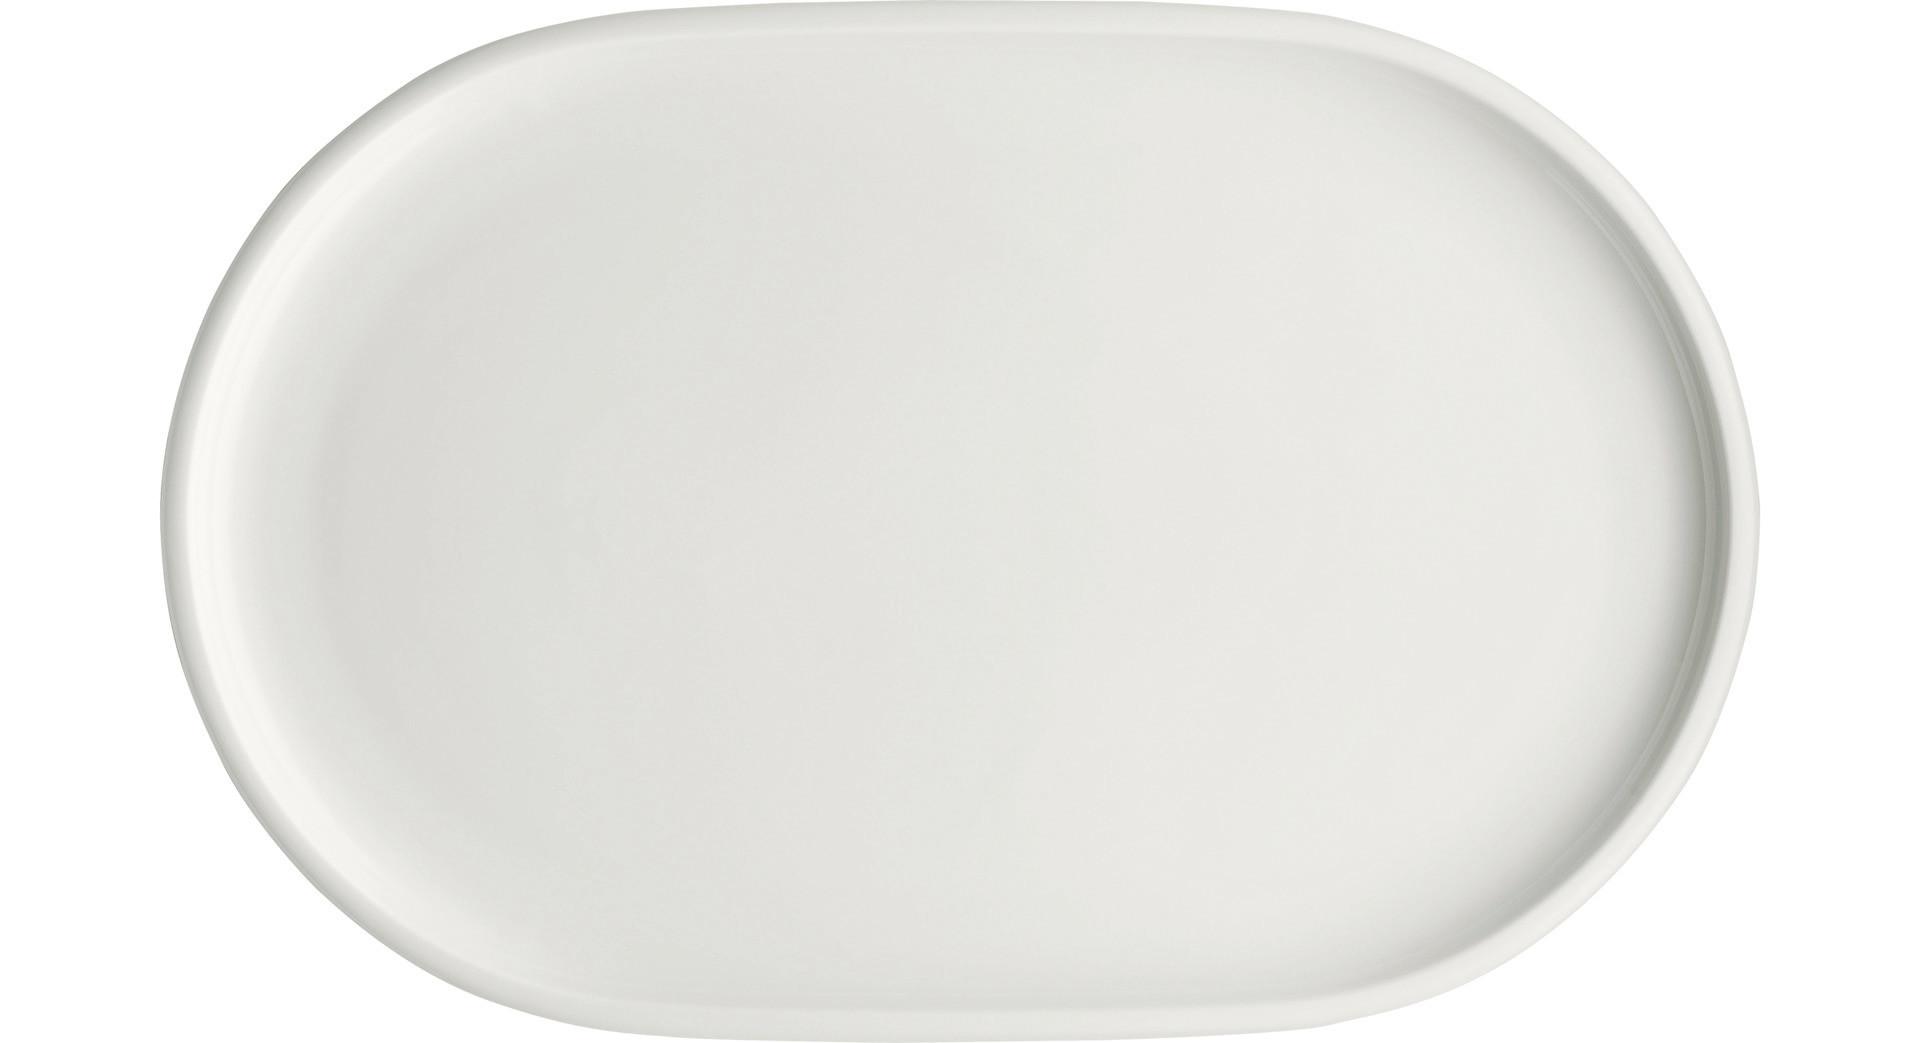 Shiro, Coupplatte oval 300 x 194 mm